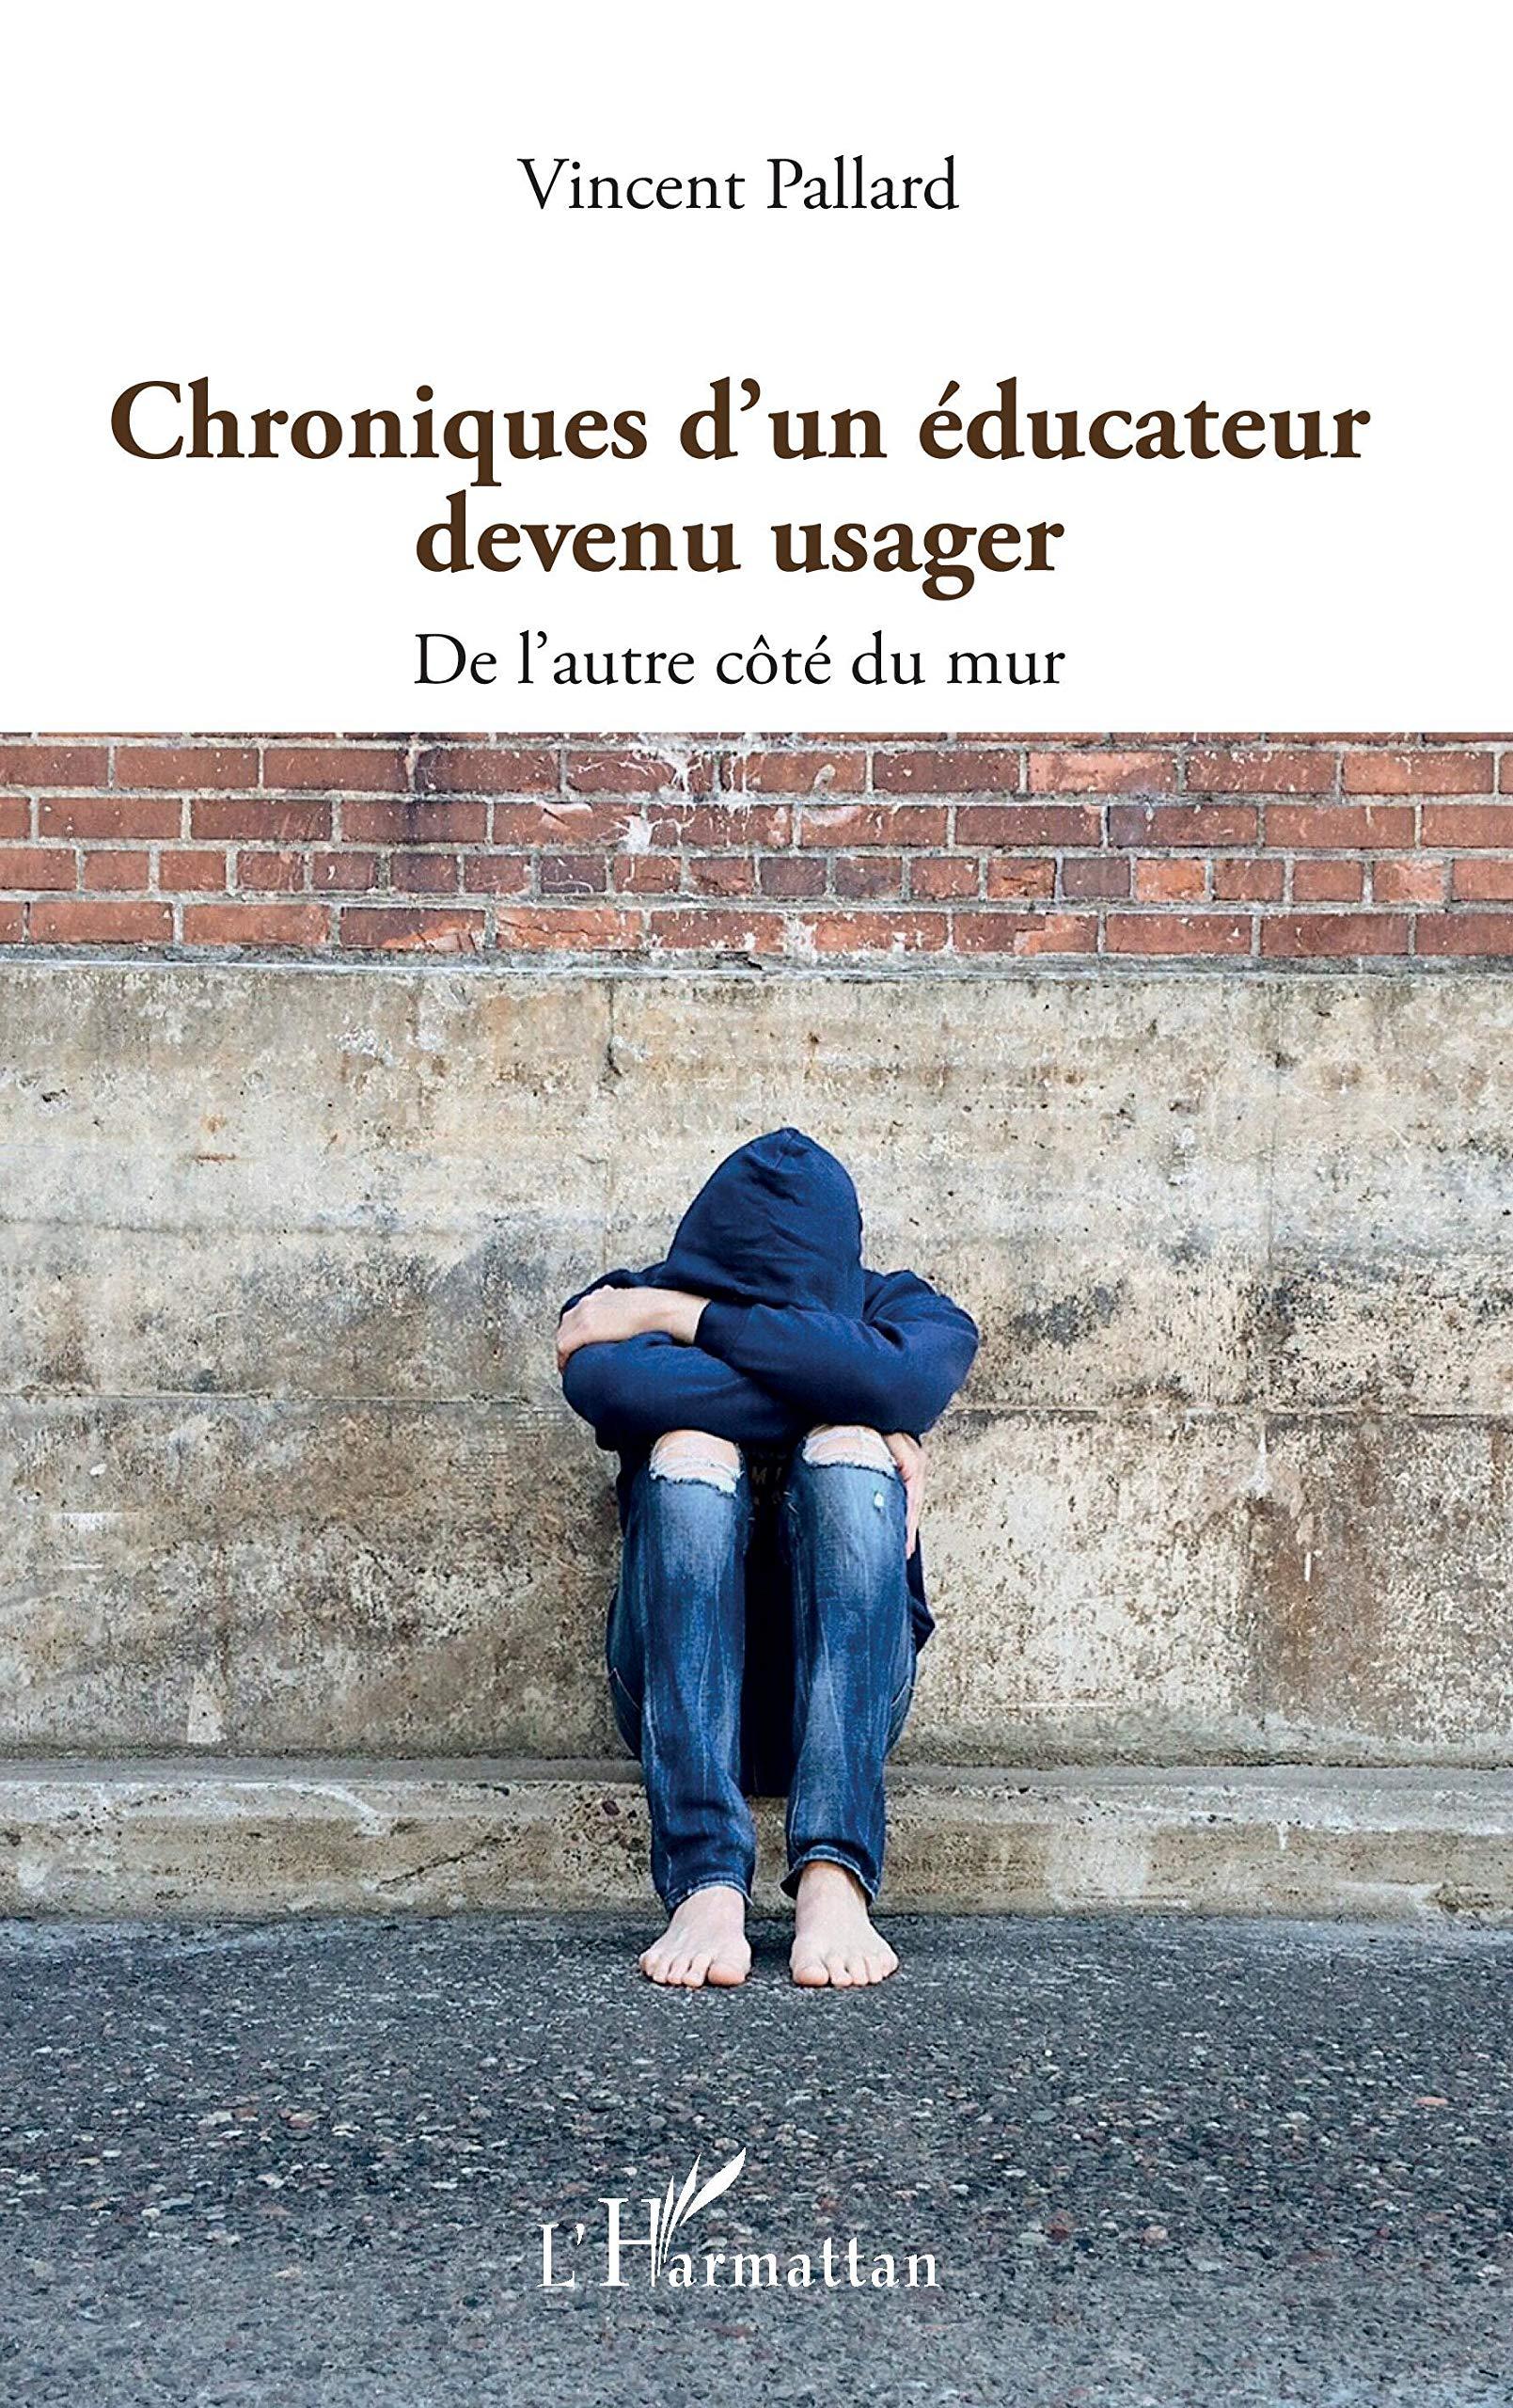 Livre & Handicap - Vincent Pallard